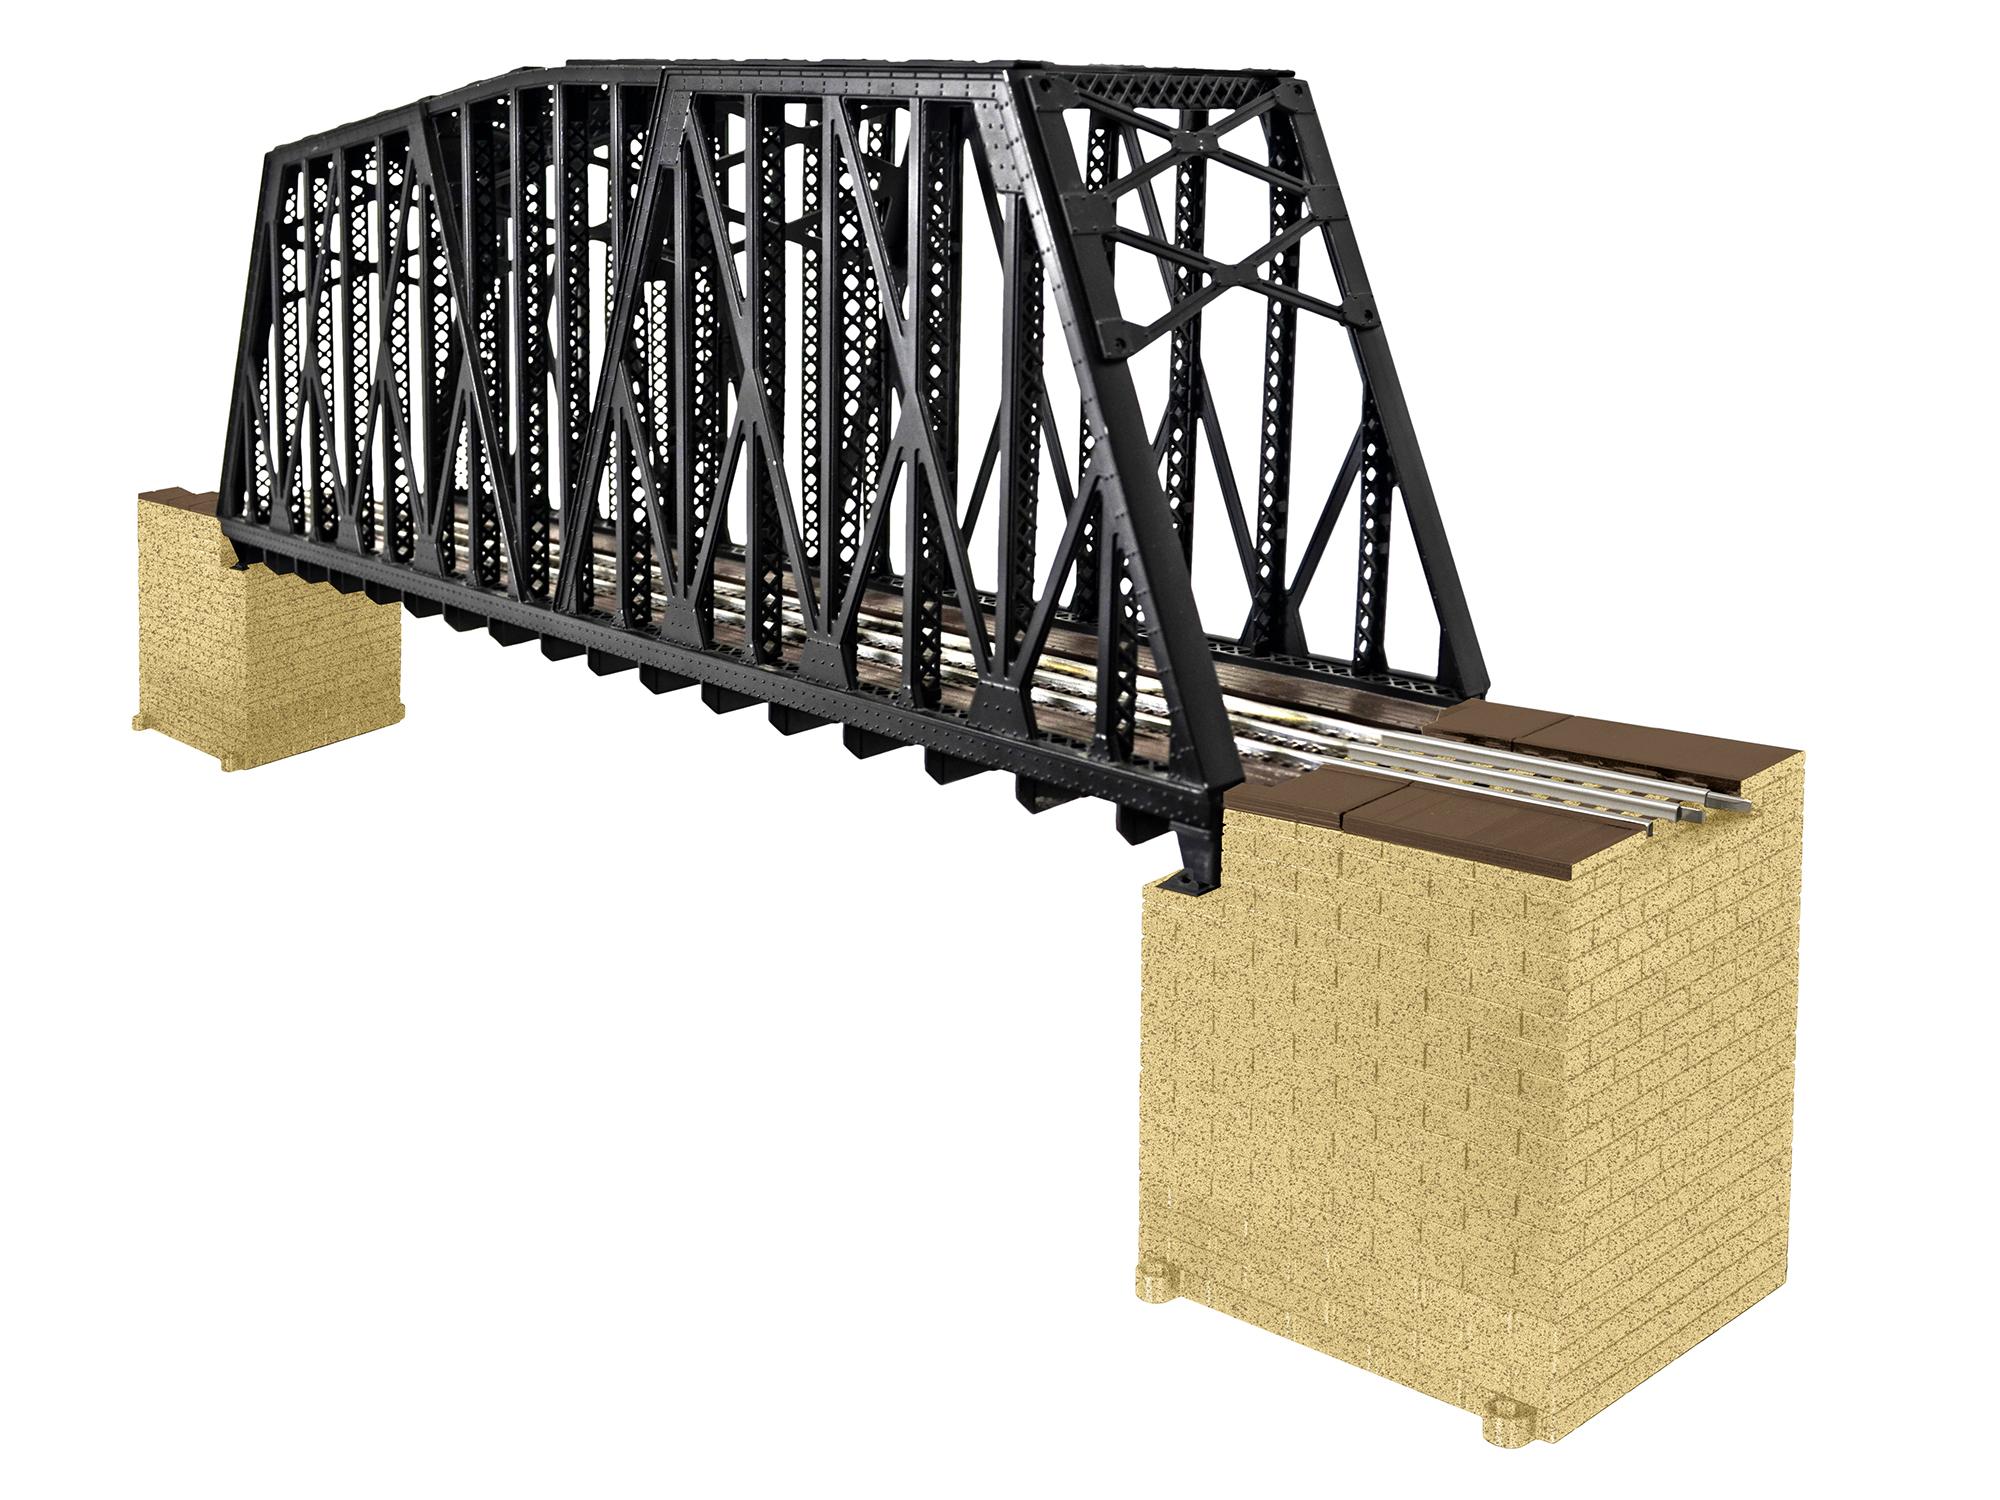 Lionel 682110 O Extended Truss Bridge 434-682110